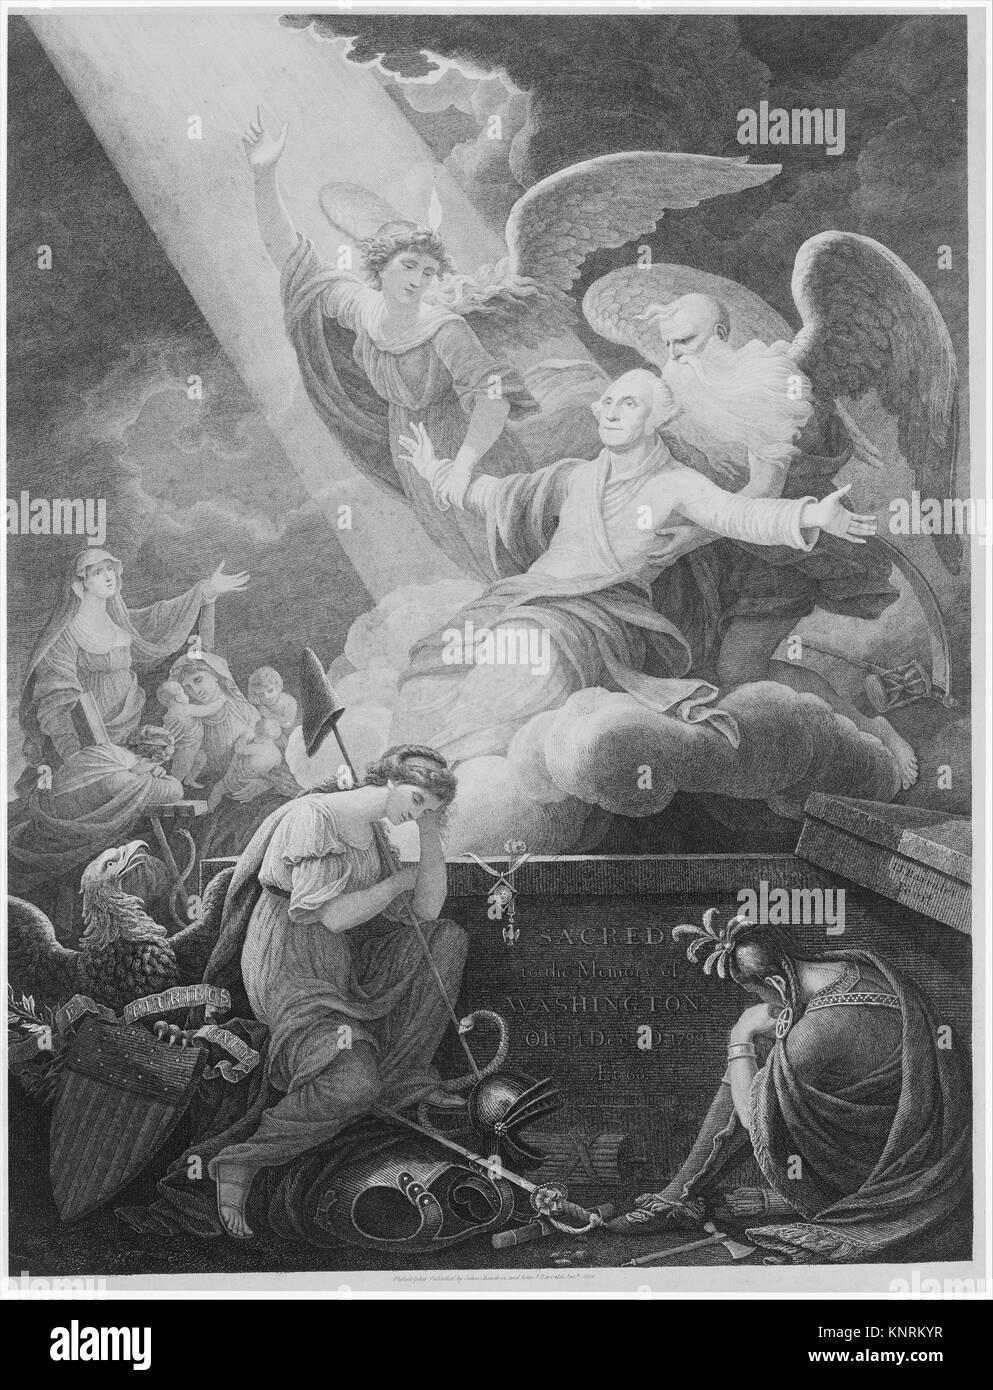 Apotheosis of Washington. Artist: John James Barralet (Irish, Dublin ca. 1747-1815 Philadelphia, Pennsylvania); - Stock Image